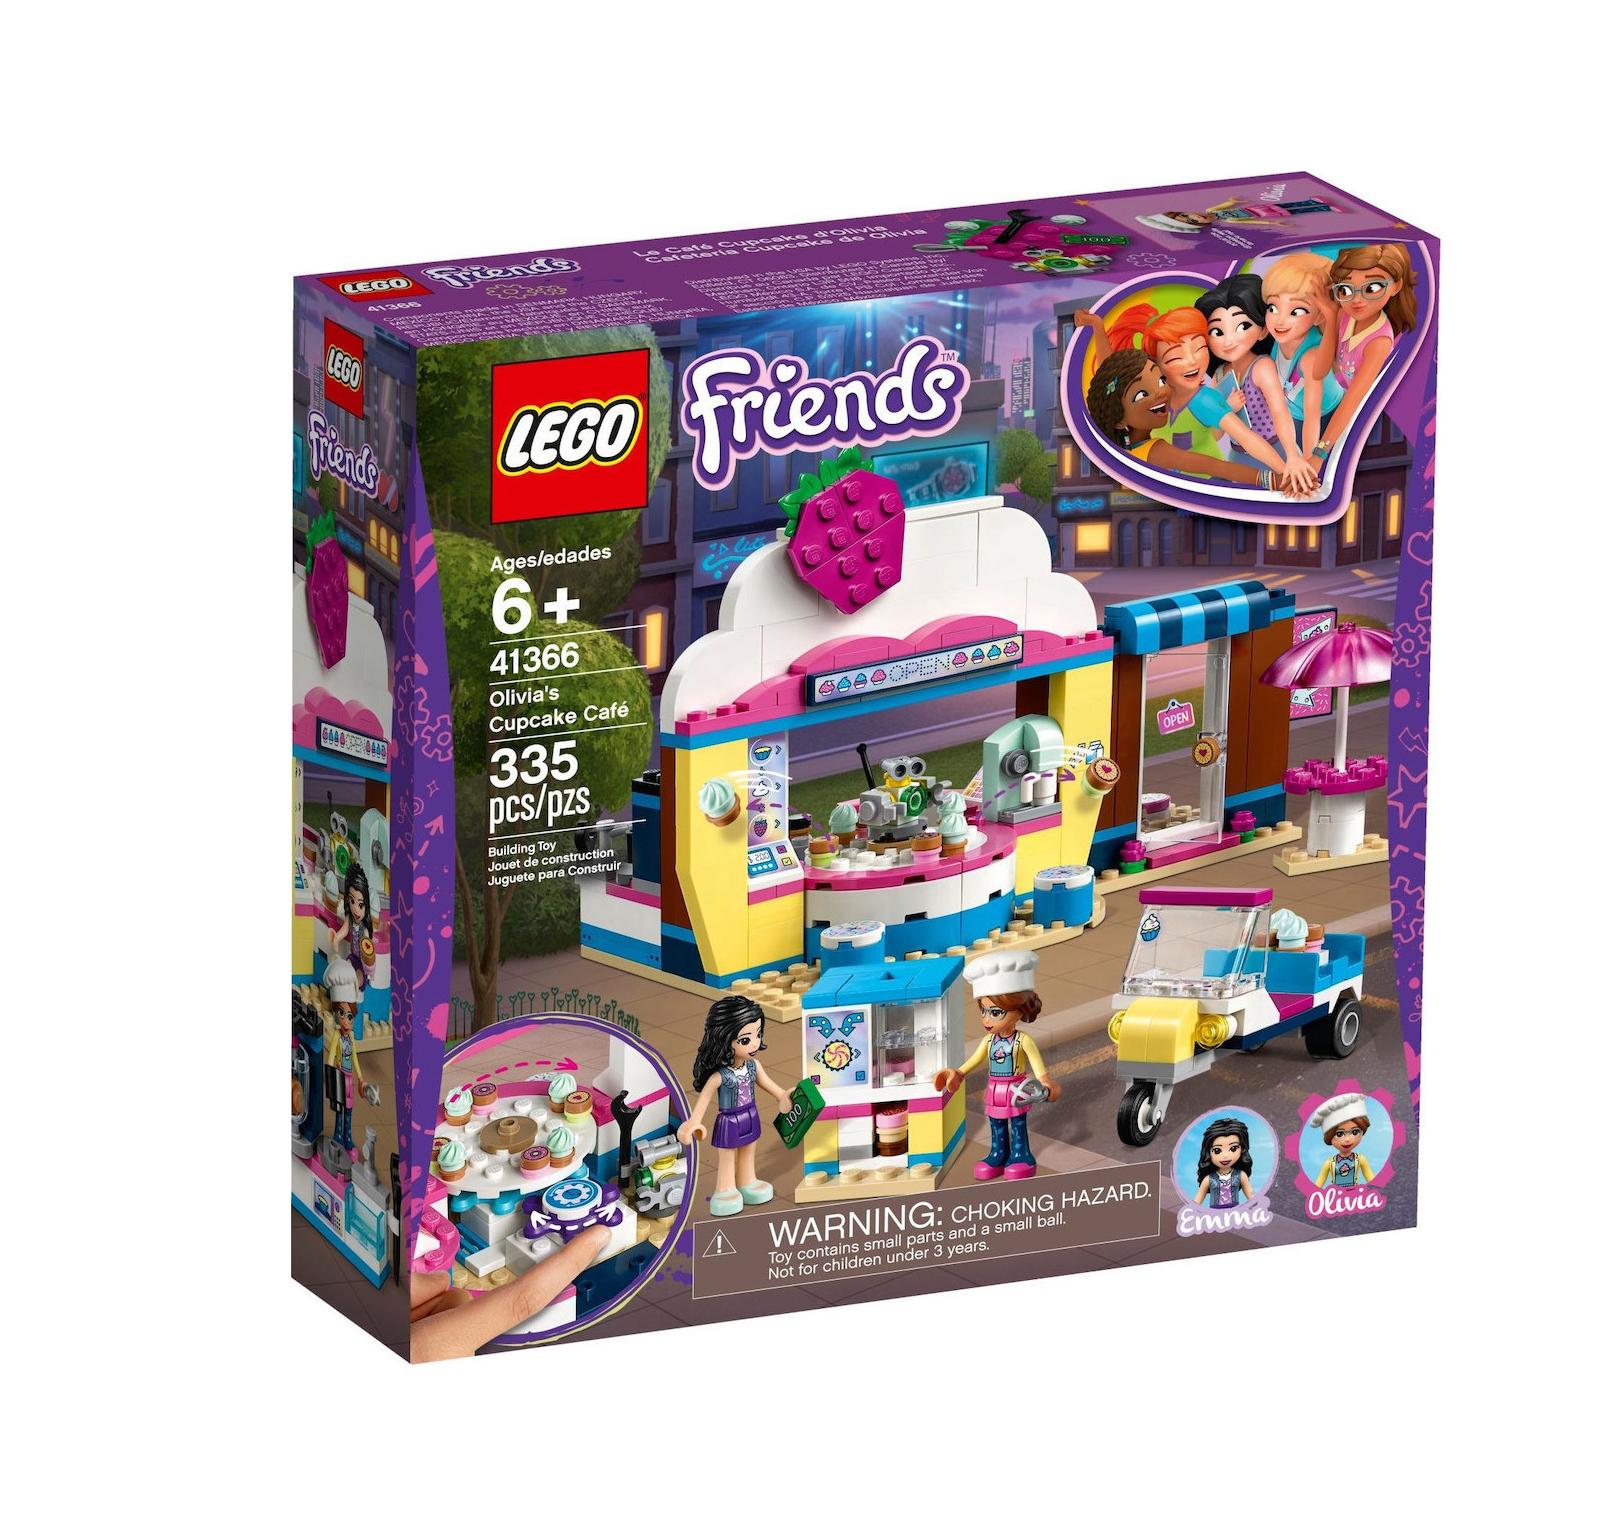 Lego Friends: Olivia's Cupcake Cafe 41366